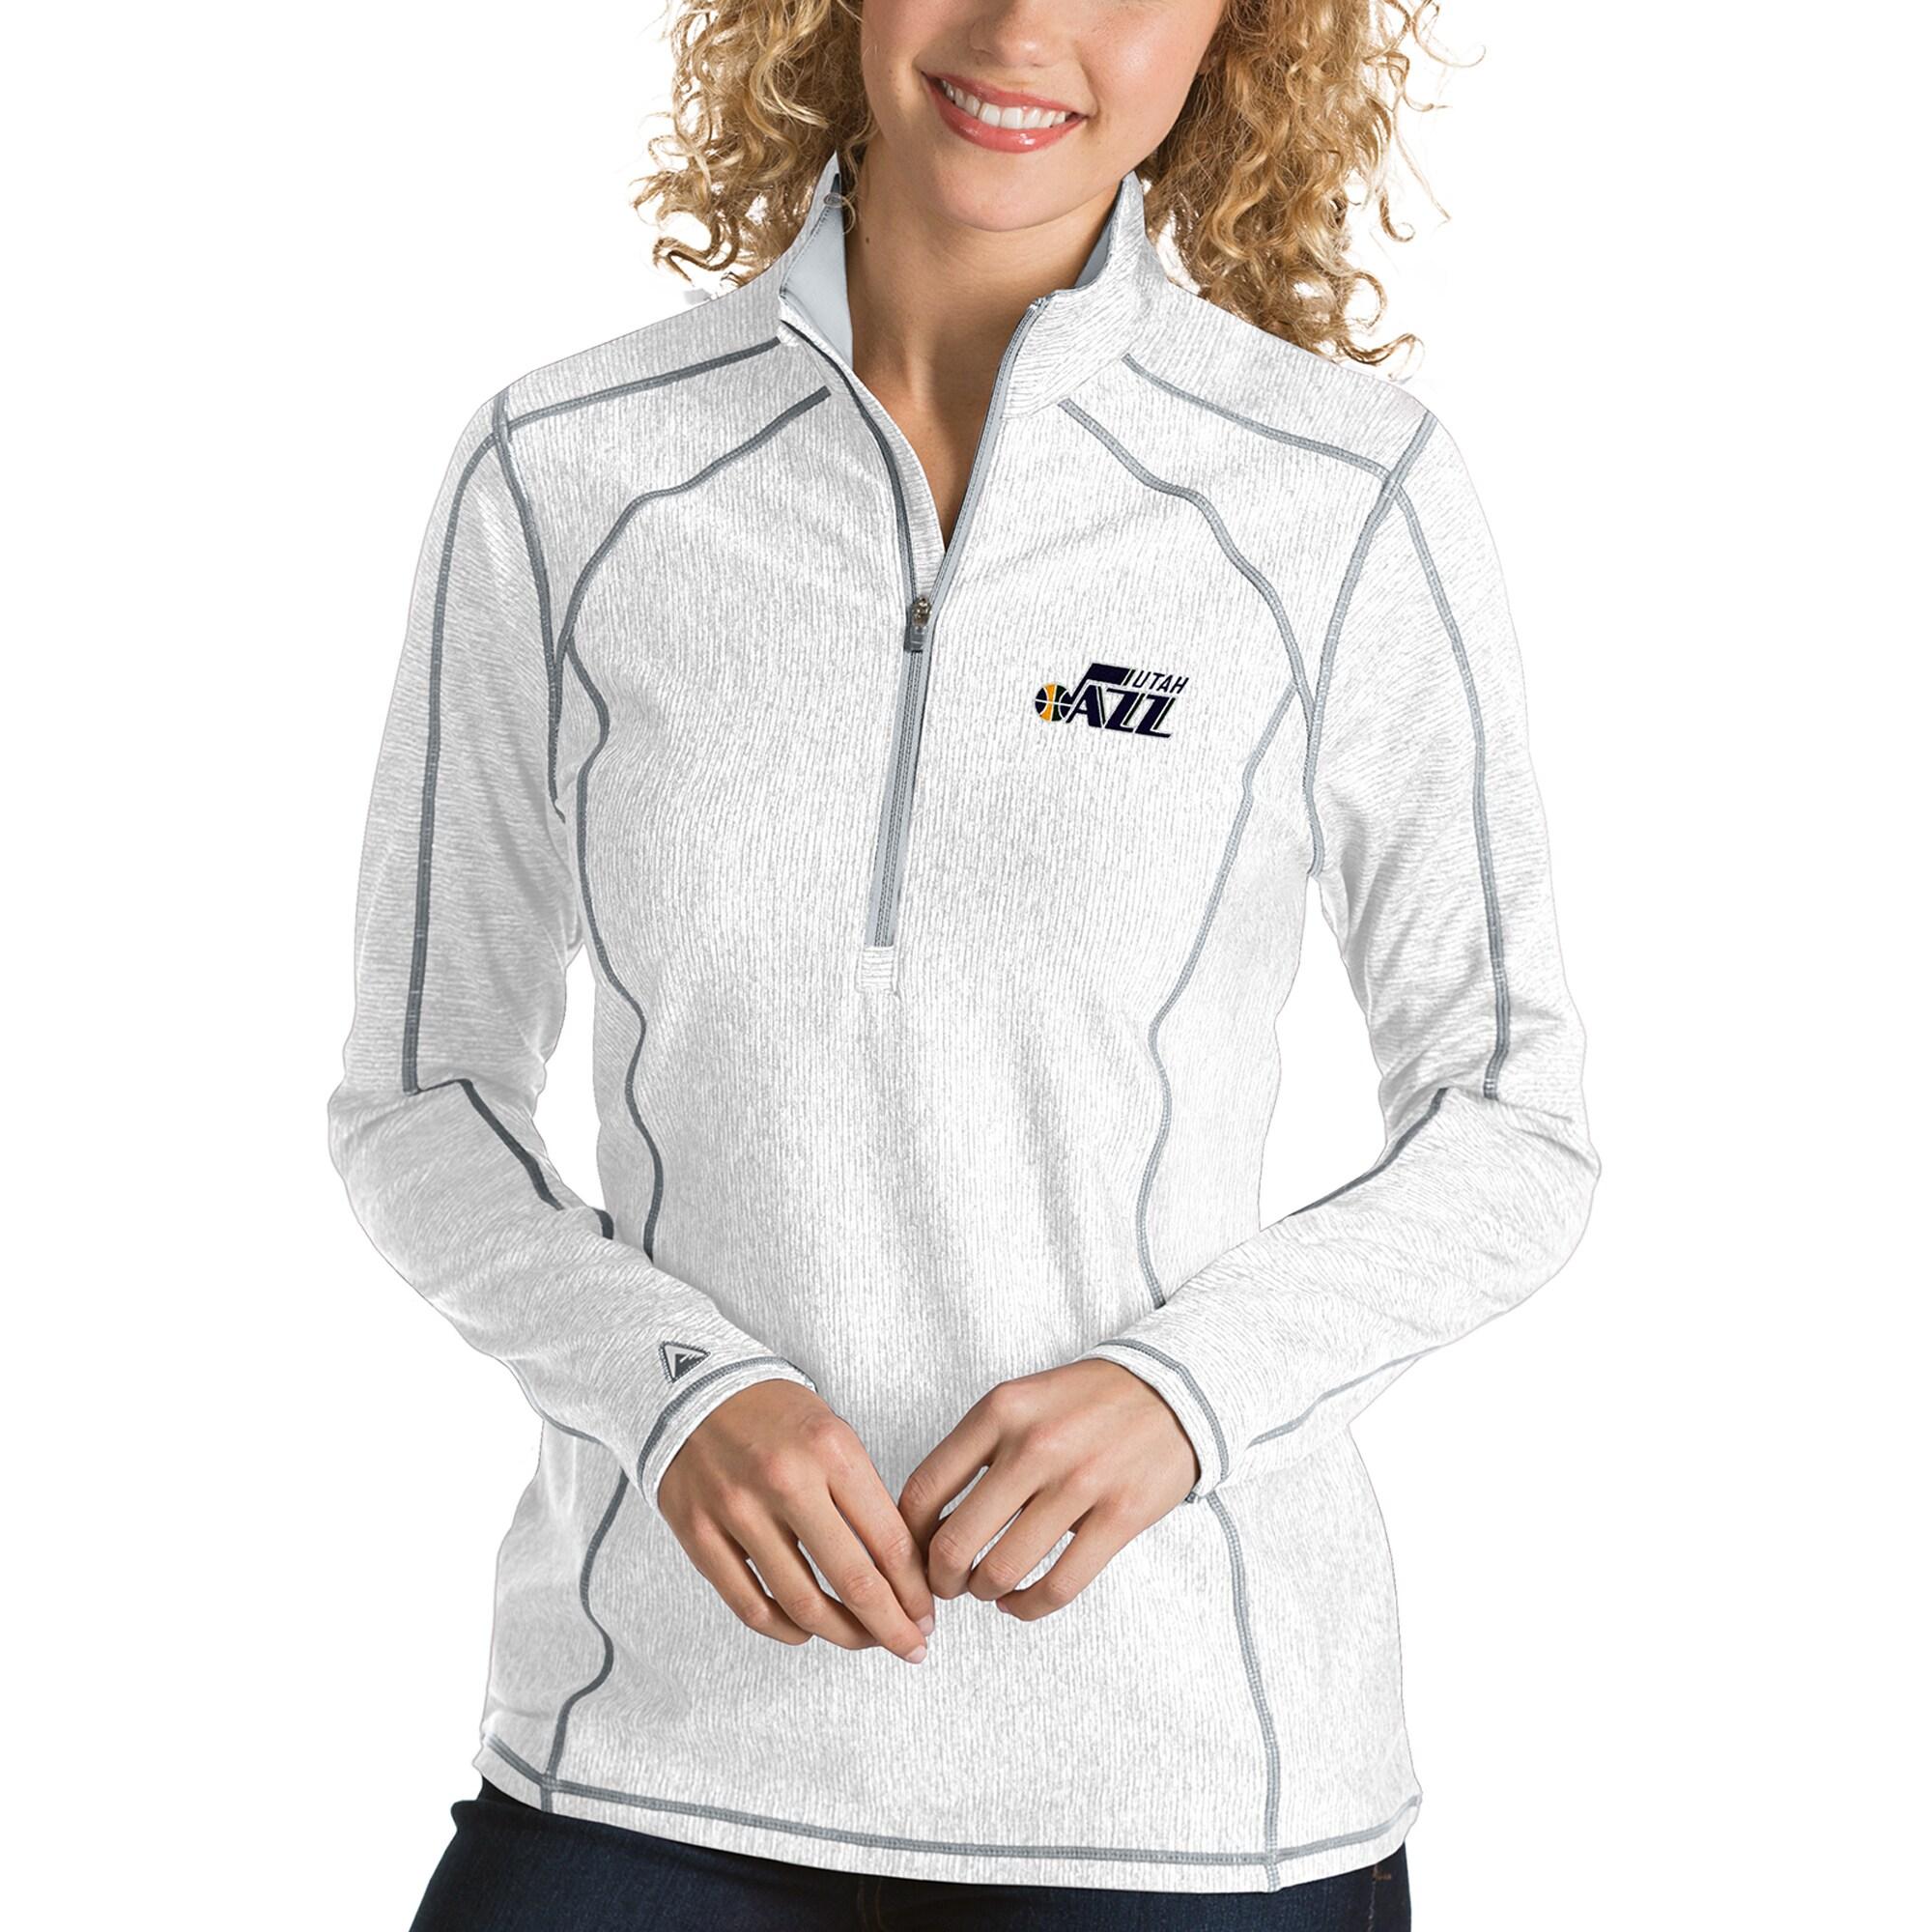 Utah Jazz Antigua Women's Tempo Half-Zip Pullover Jacket - White